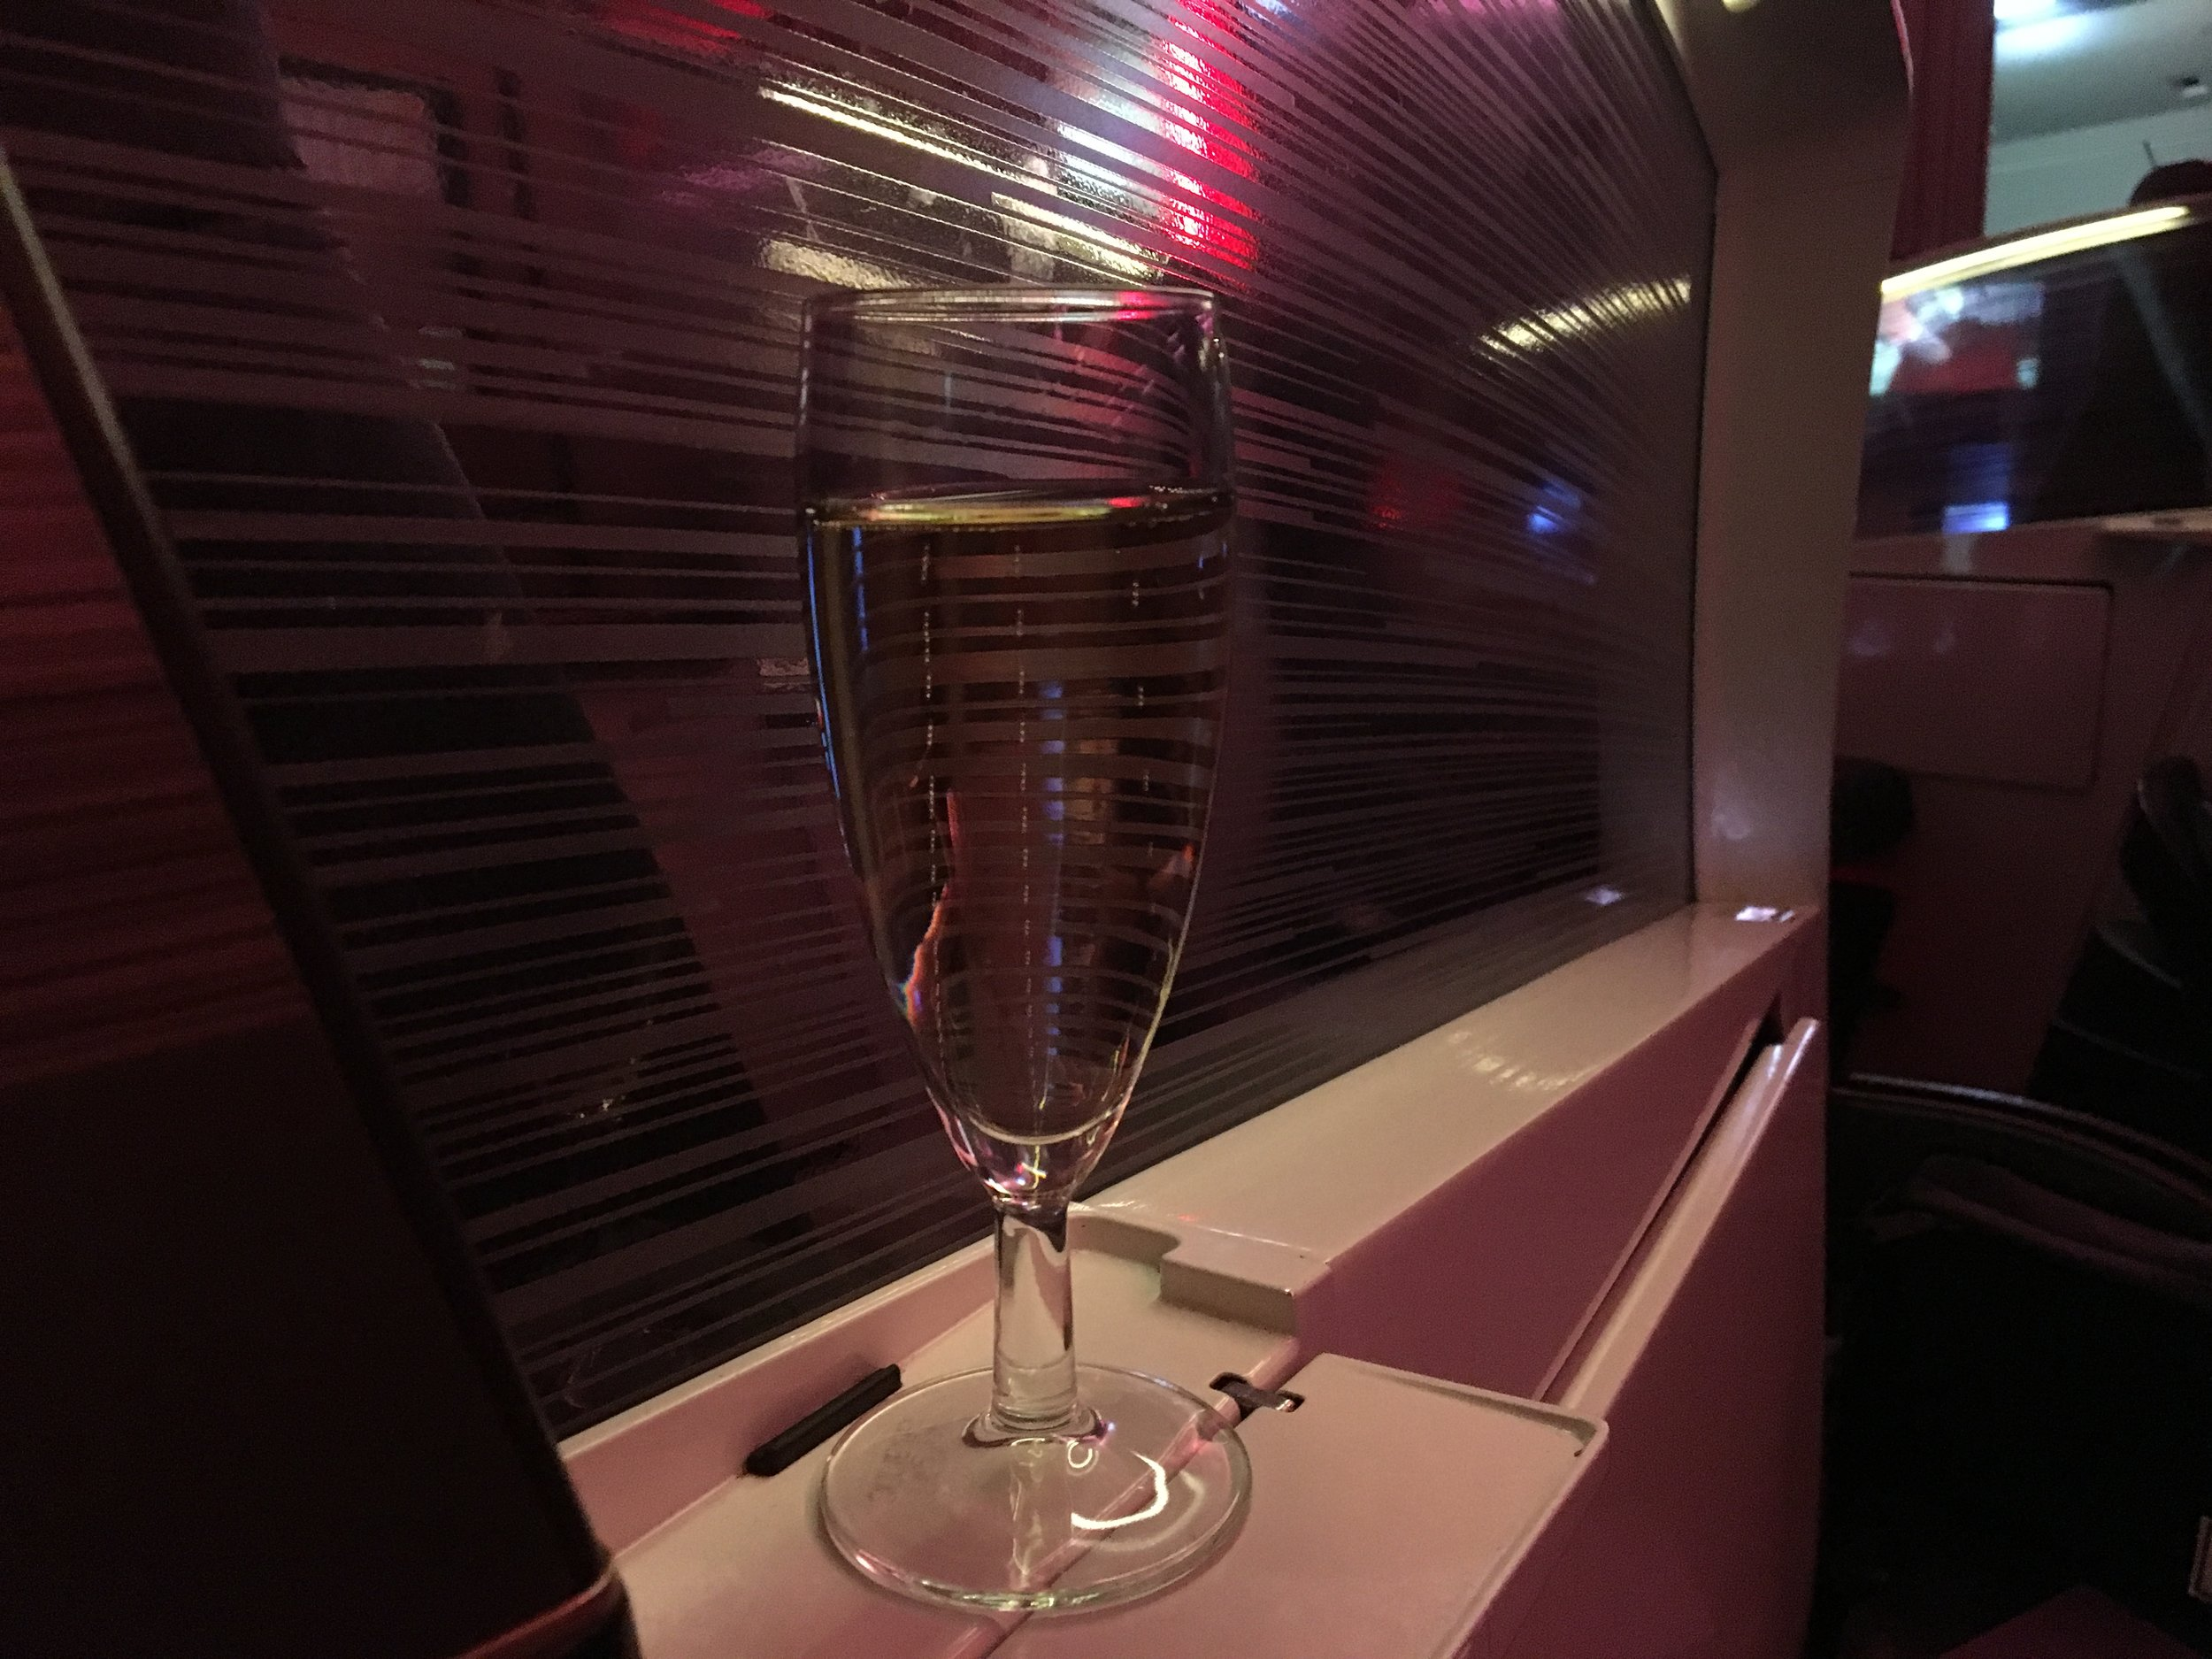 VIRGIN ATLANTIC UPPER CLASS champagne